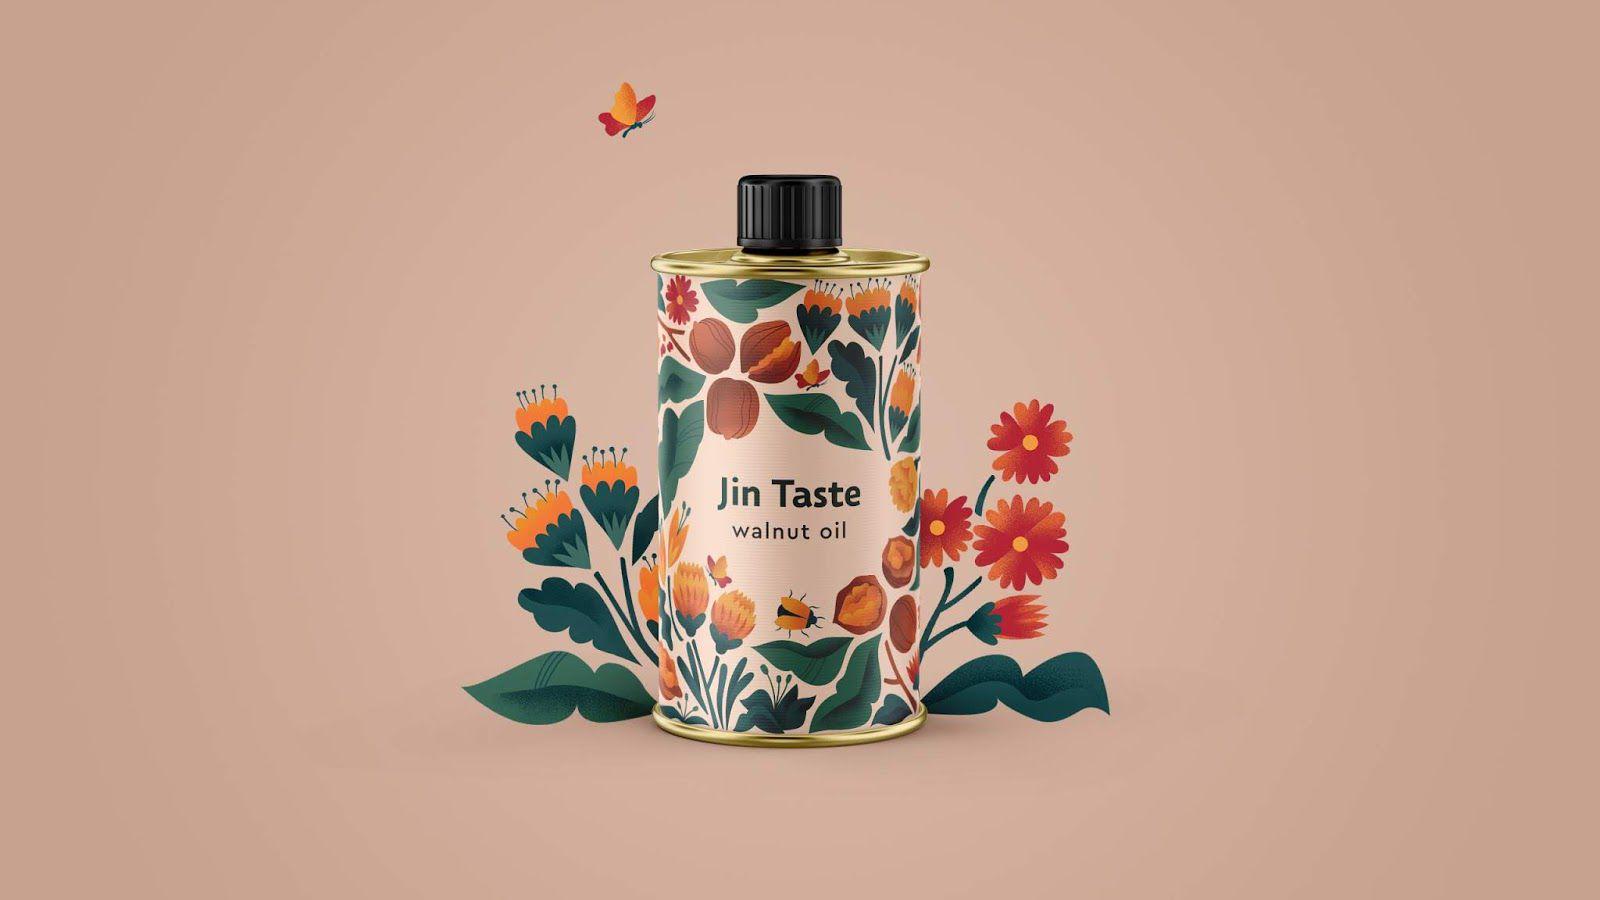 Jin Taste (huile) I Design : design studio Glad Head, Ukraine (mars 2020)